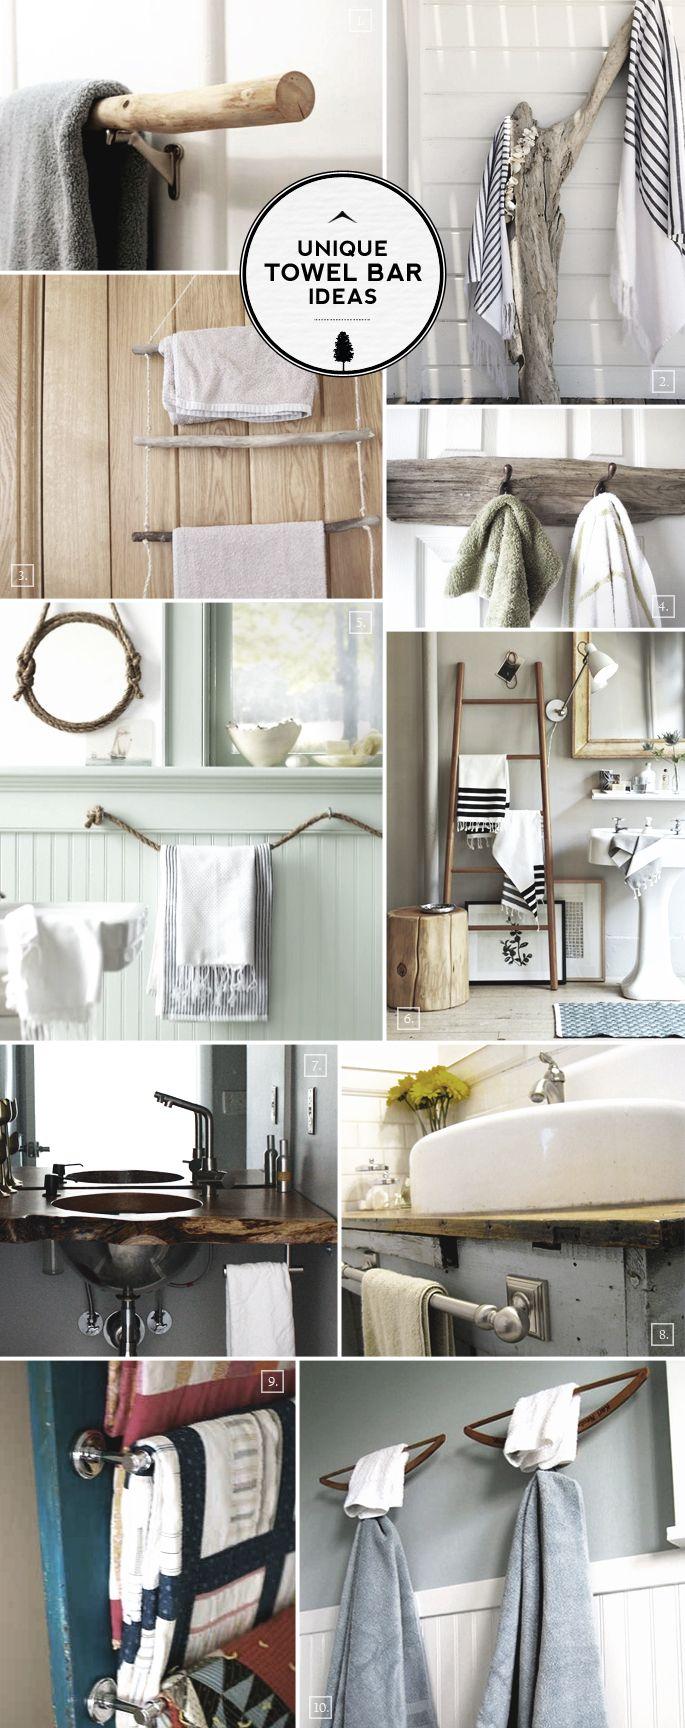 Making nautical bathroom d 233 cor by yourself bathroom designs ideas - Unique Ideas For Bathroom Towel Bars And Racks